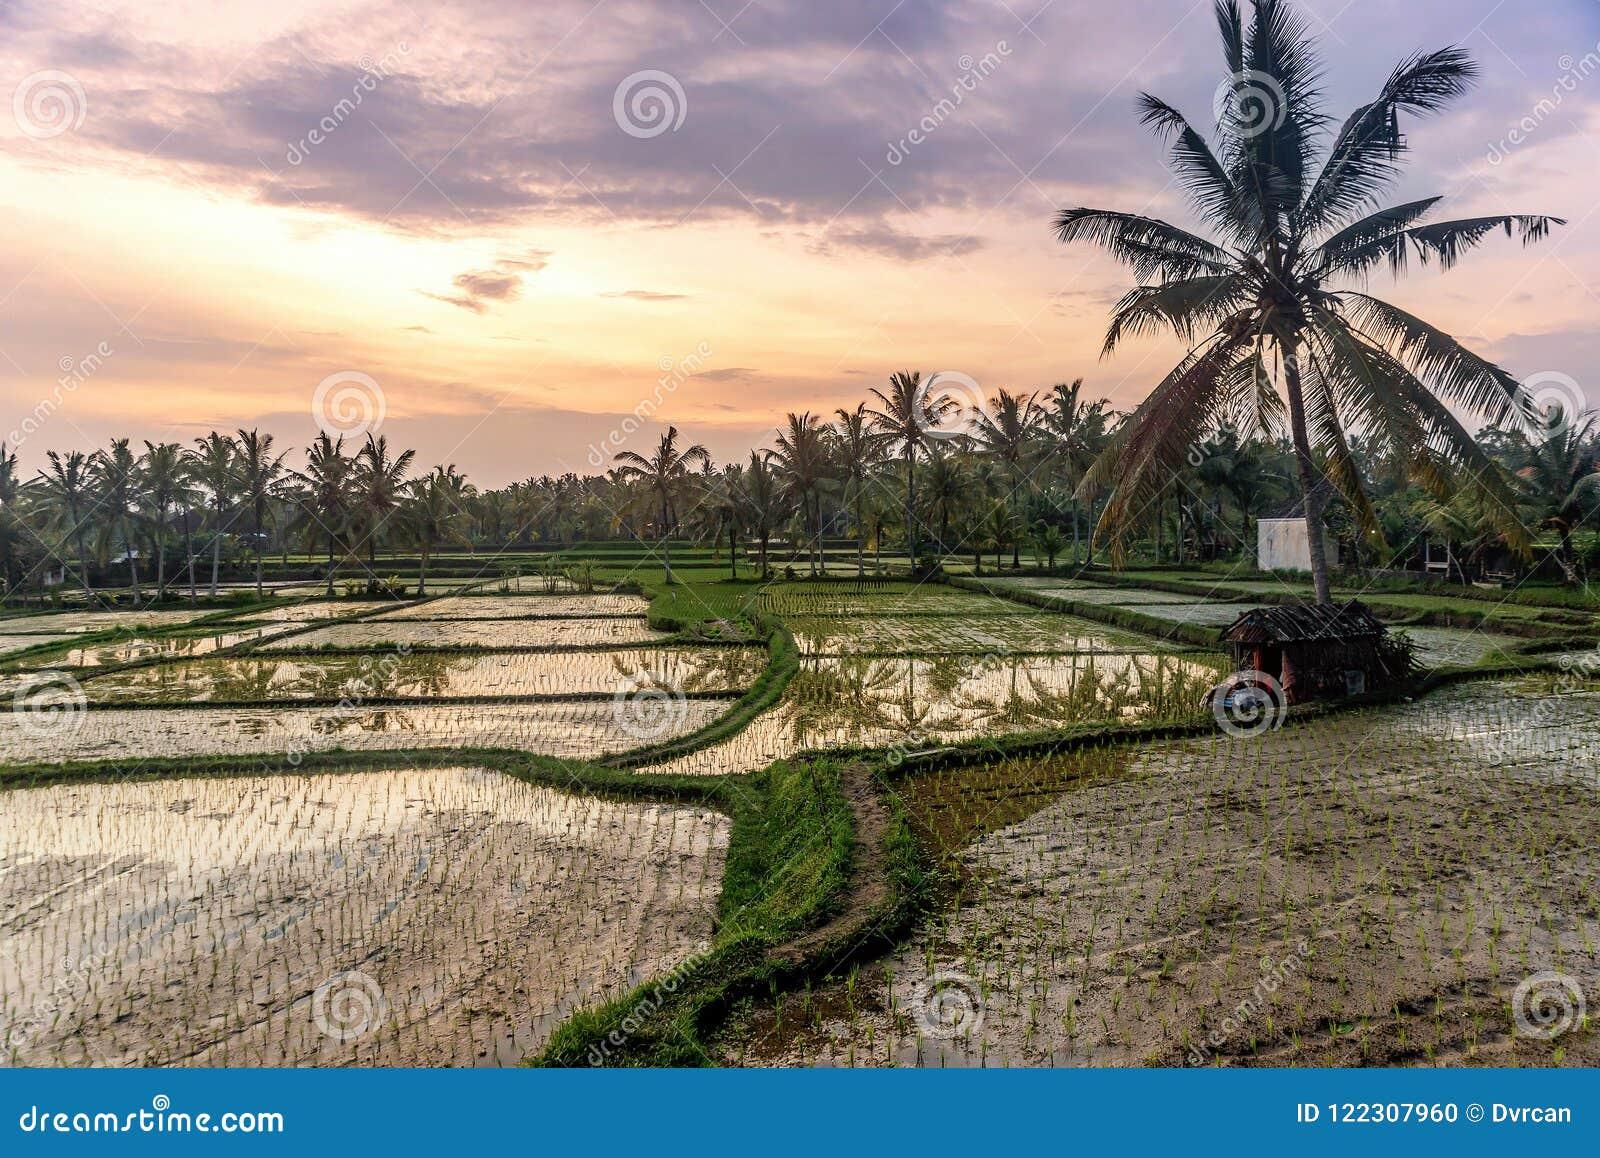 Rice tarasuje w Tegallalang, Ubud, Bali, Indonezja uprawa, gospodarstwo rolne,